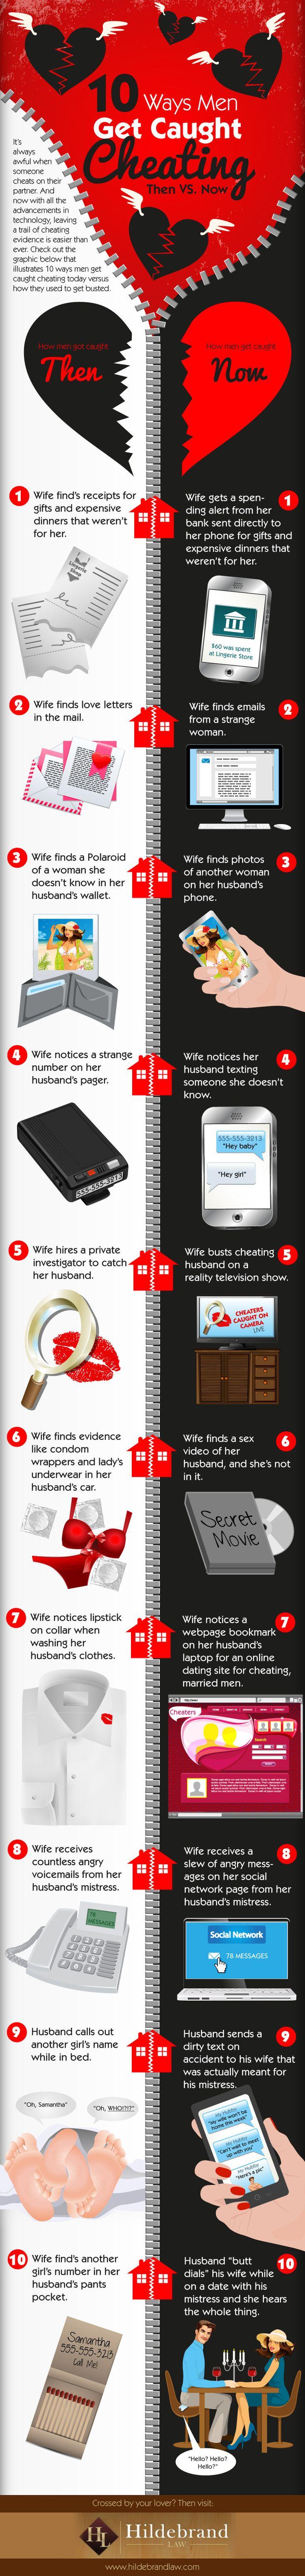 10 Ways Men Get Caught Cheating: Then vs Now